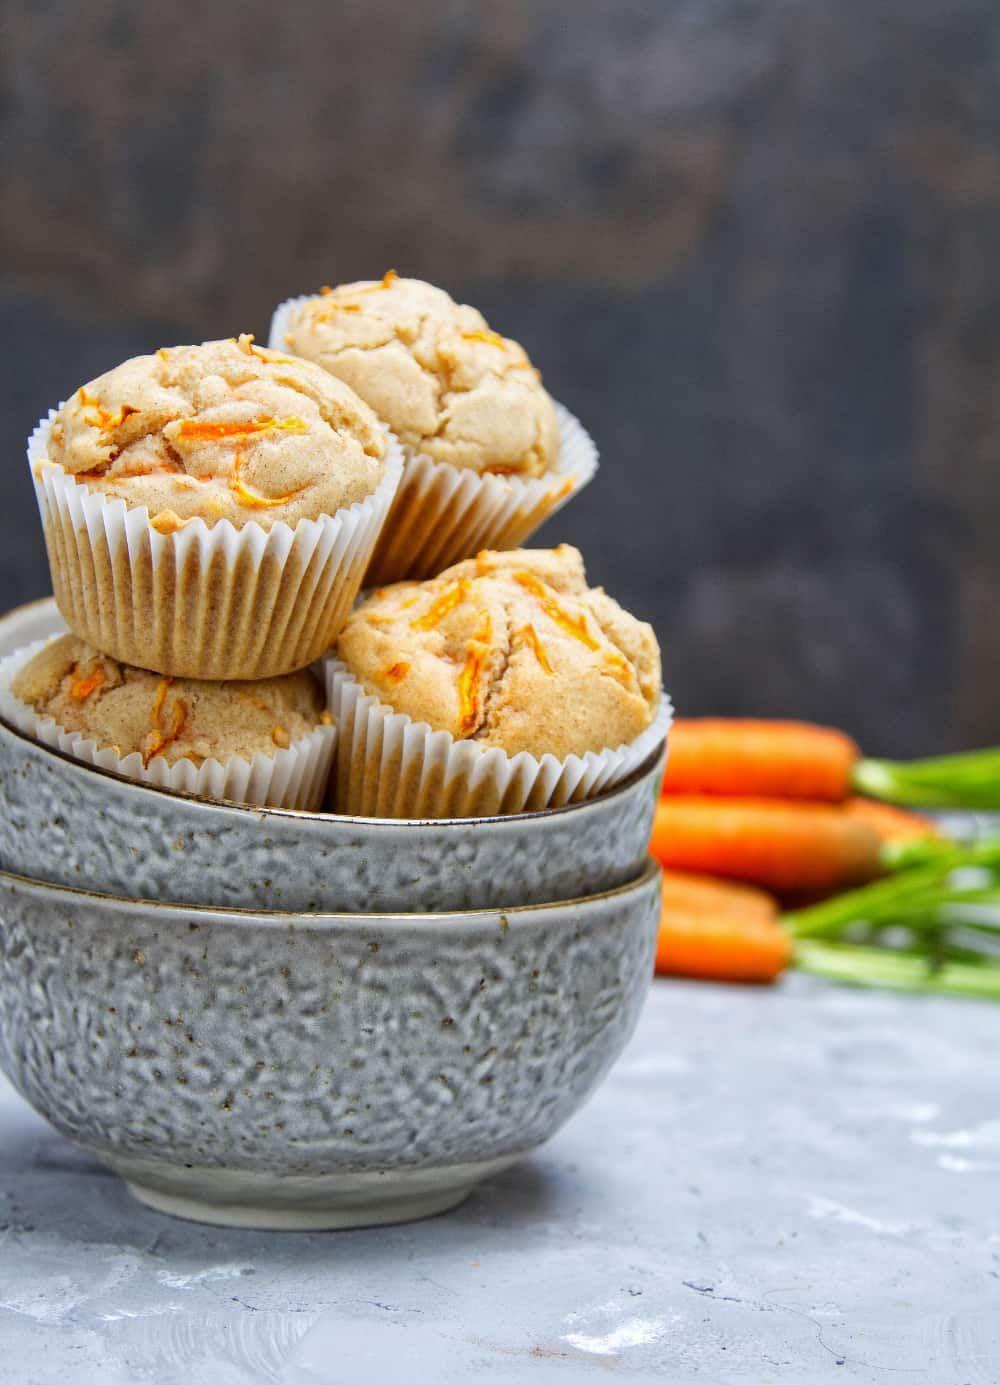 Carrot Cake Cupcakes Recipe in 2020 Carrot cake